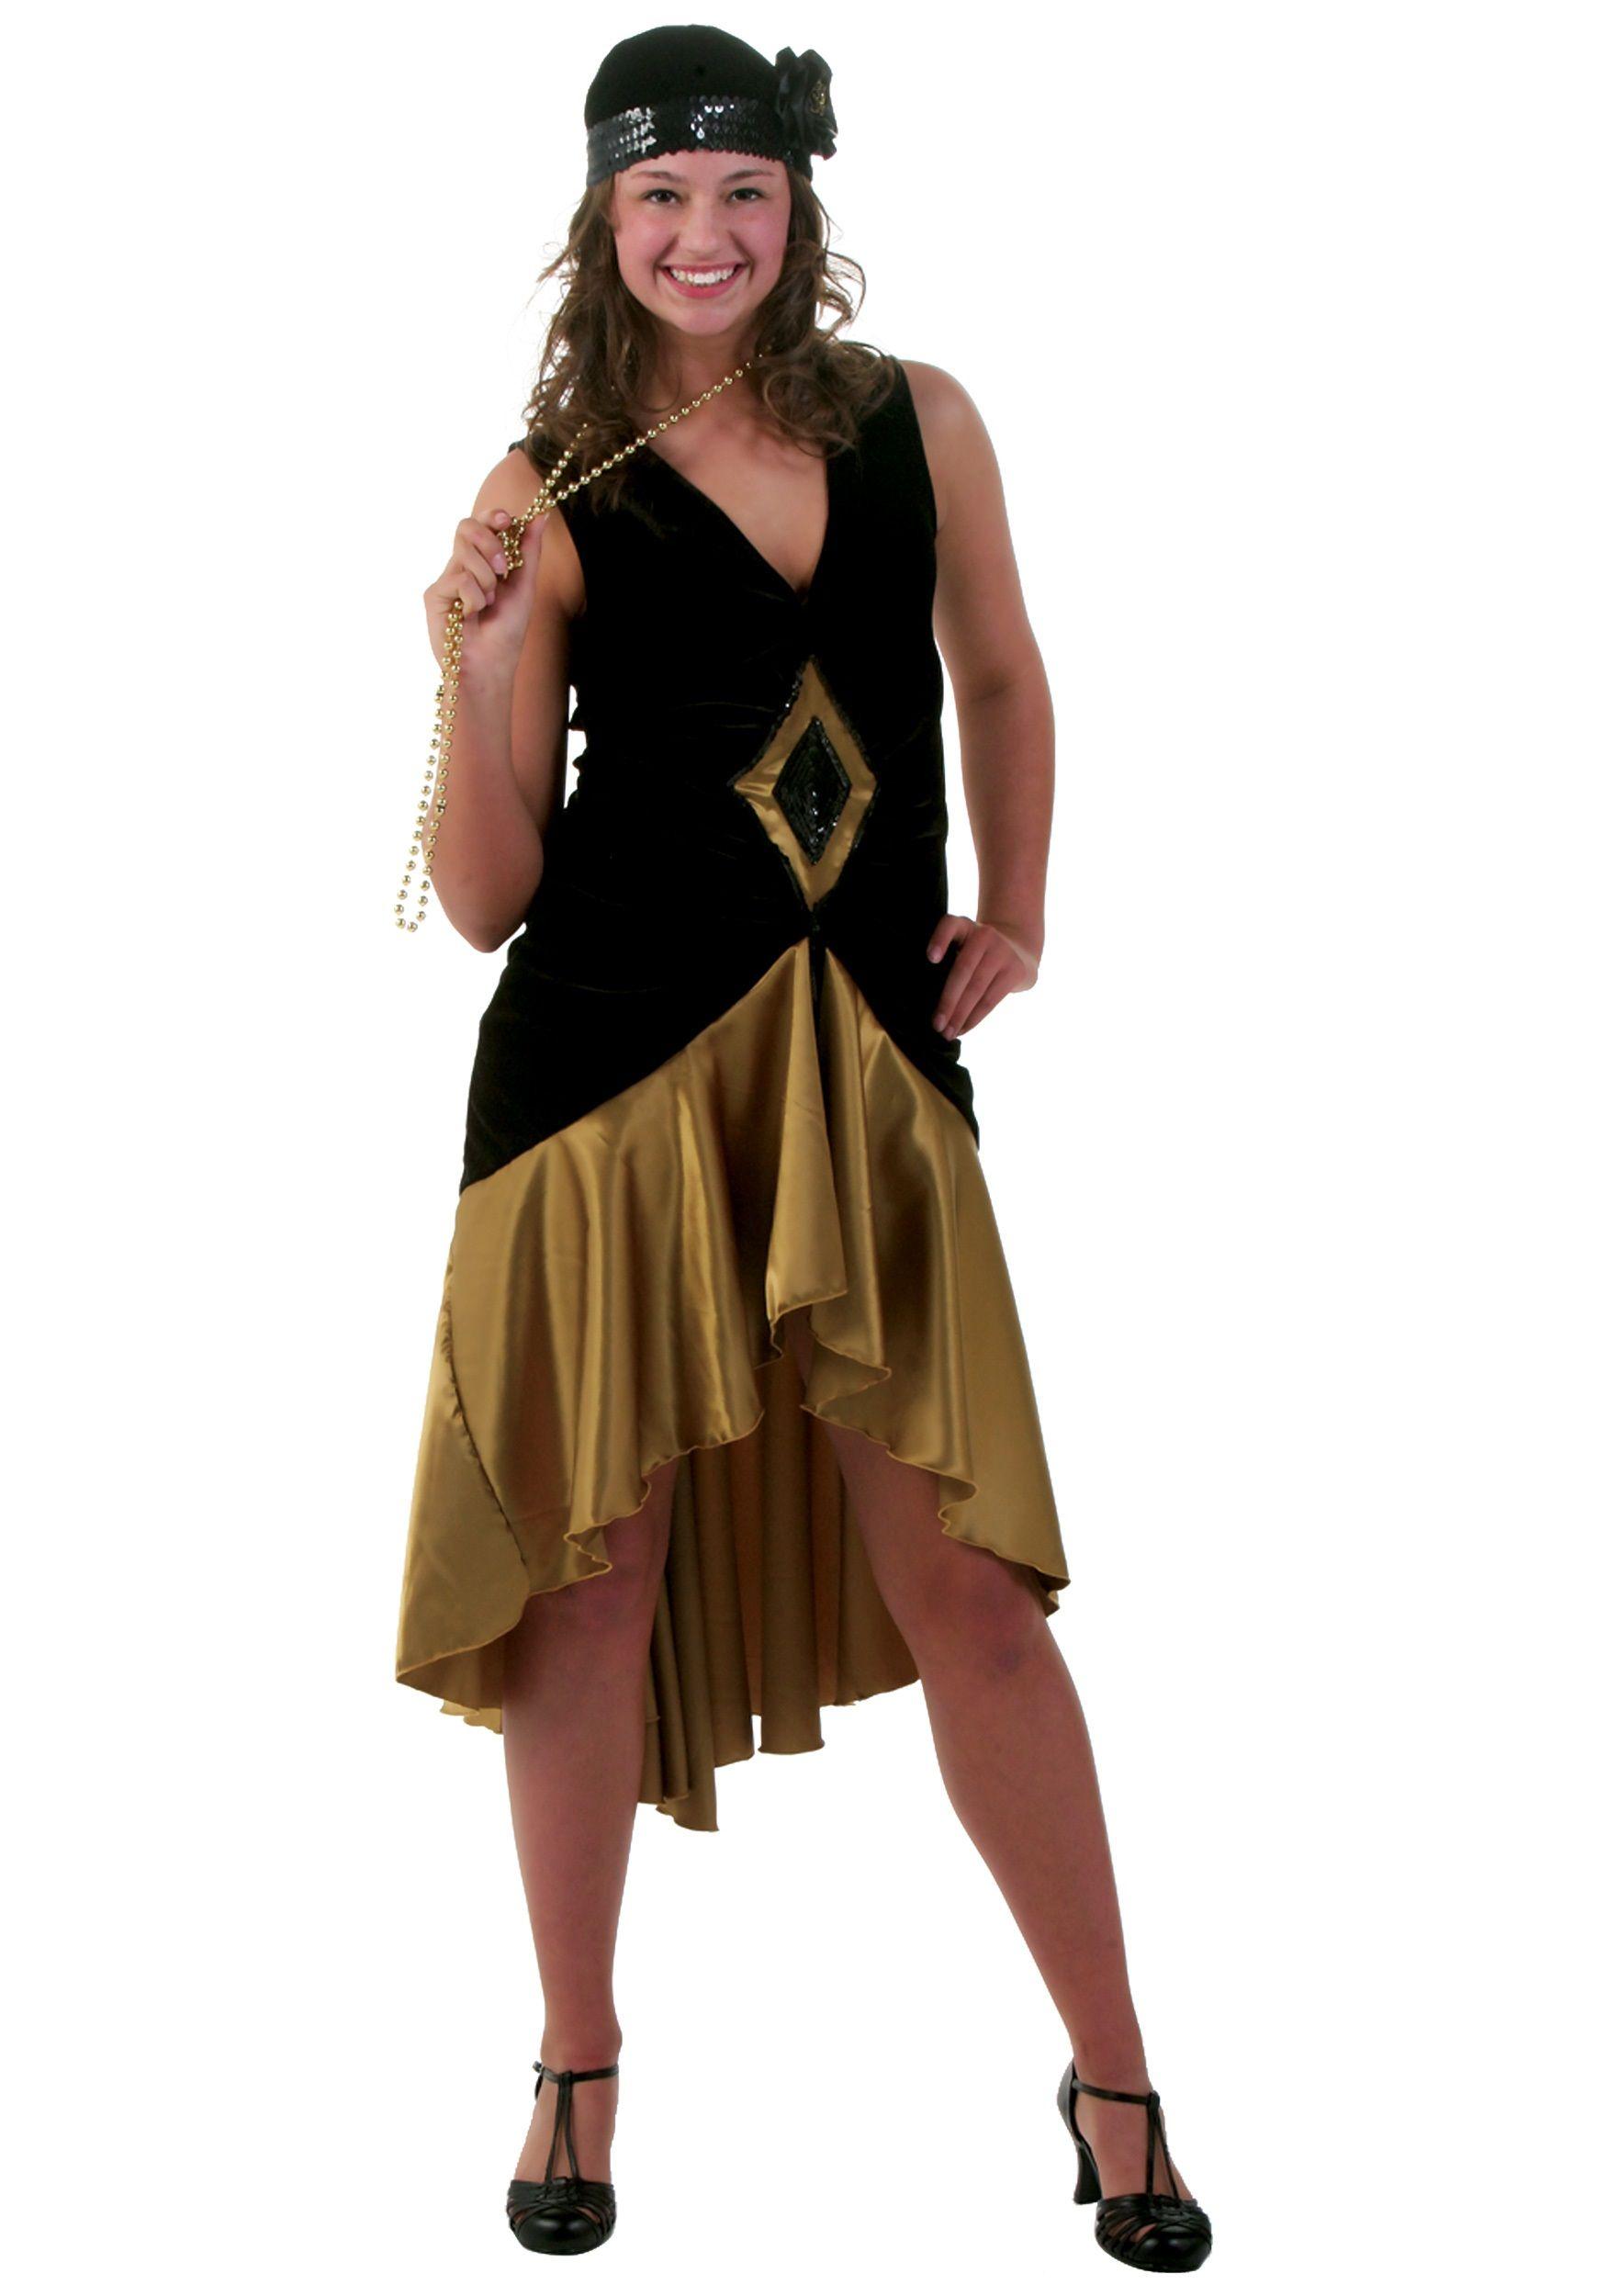 Details about Fashion Flapper Adult Plus Size Costume Roaring 20\'s ...